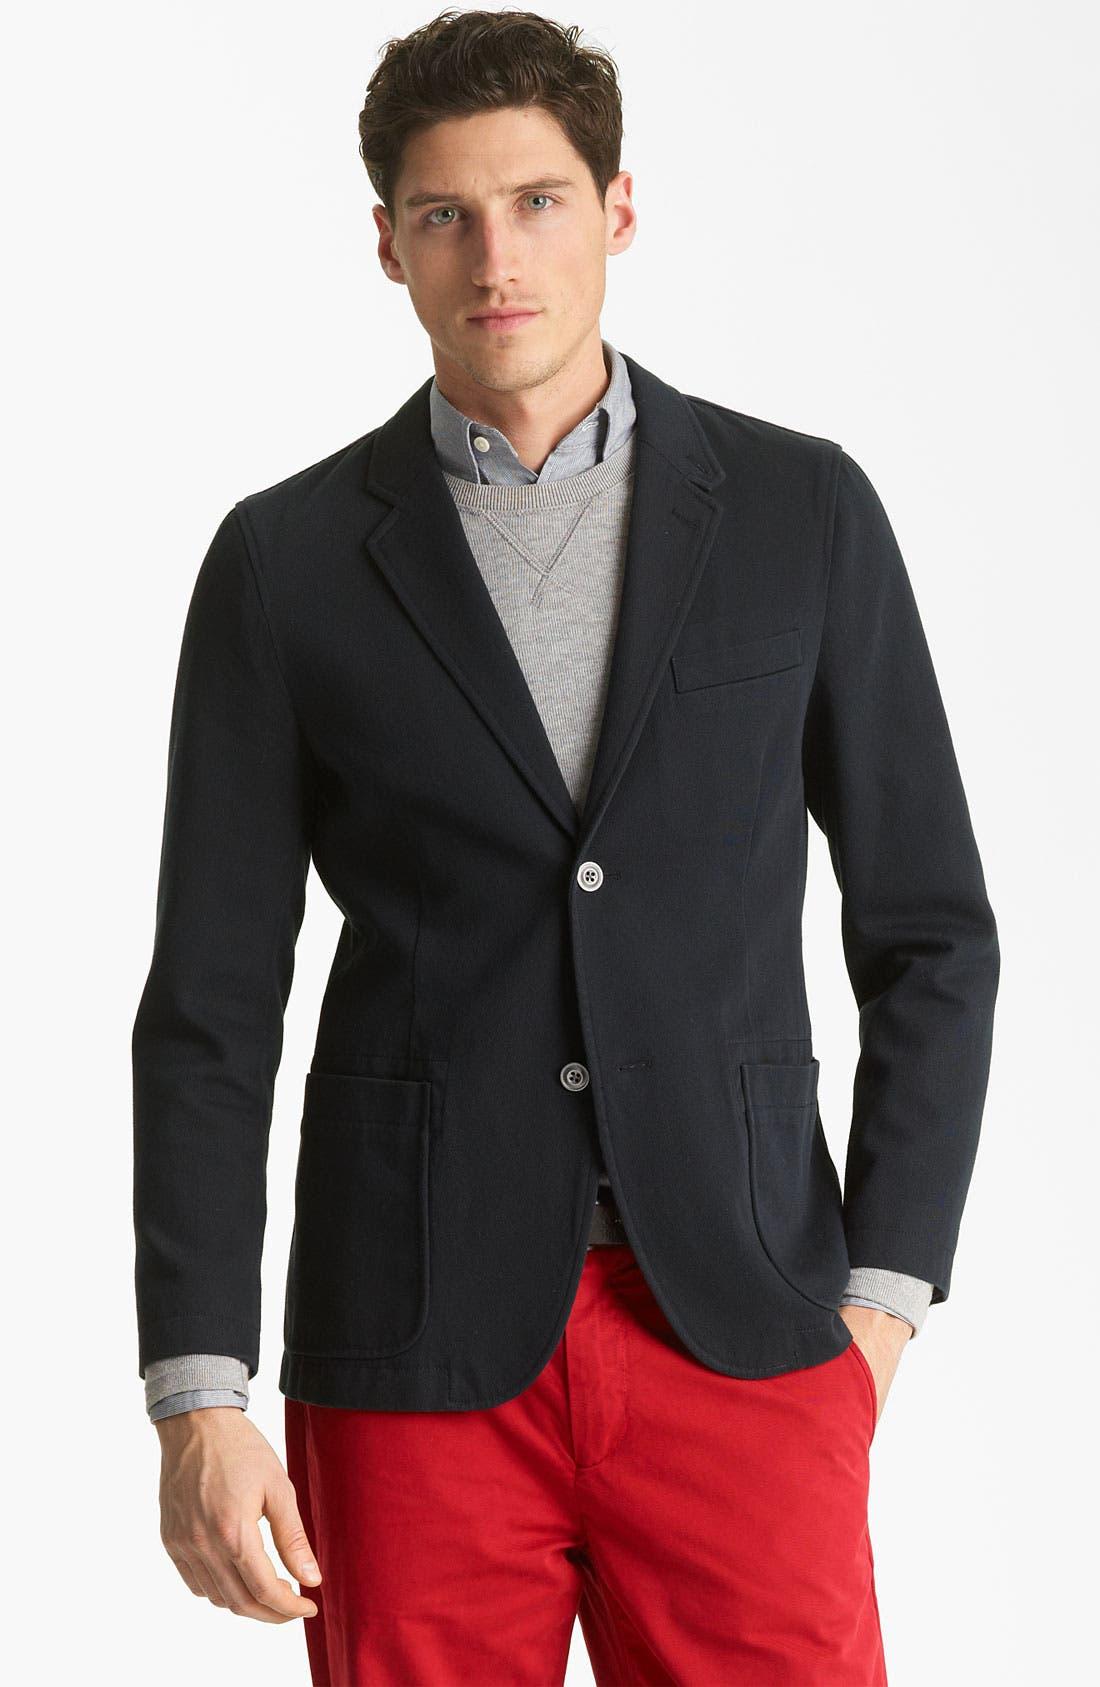 Alternate Image 1 Selected - Jack Spade 'Sanborn' Twill Cotton Blazer